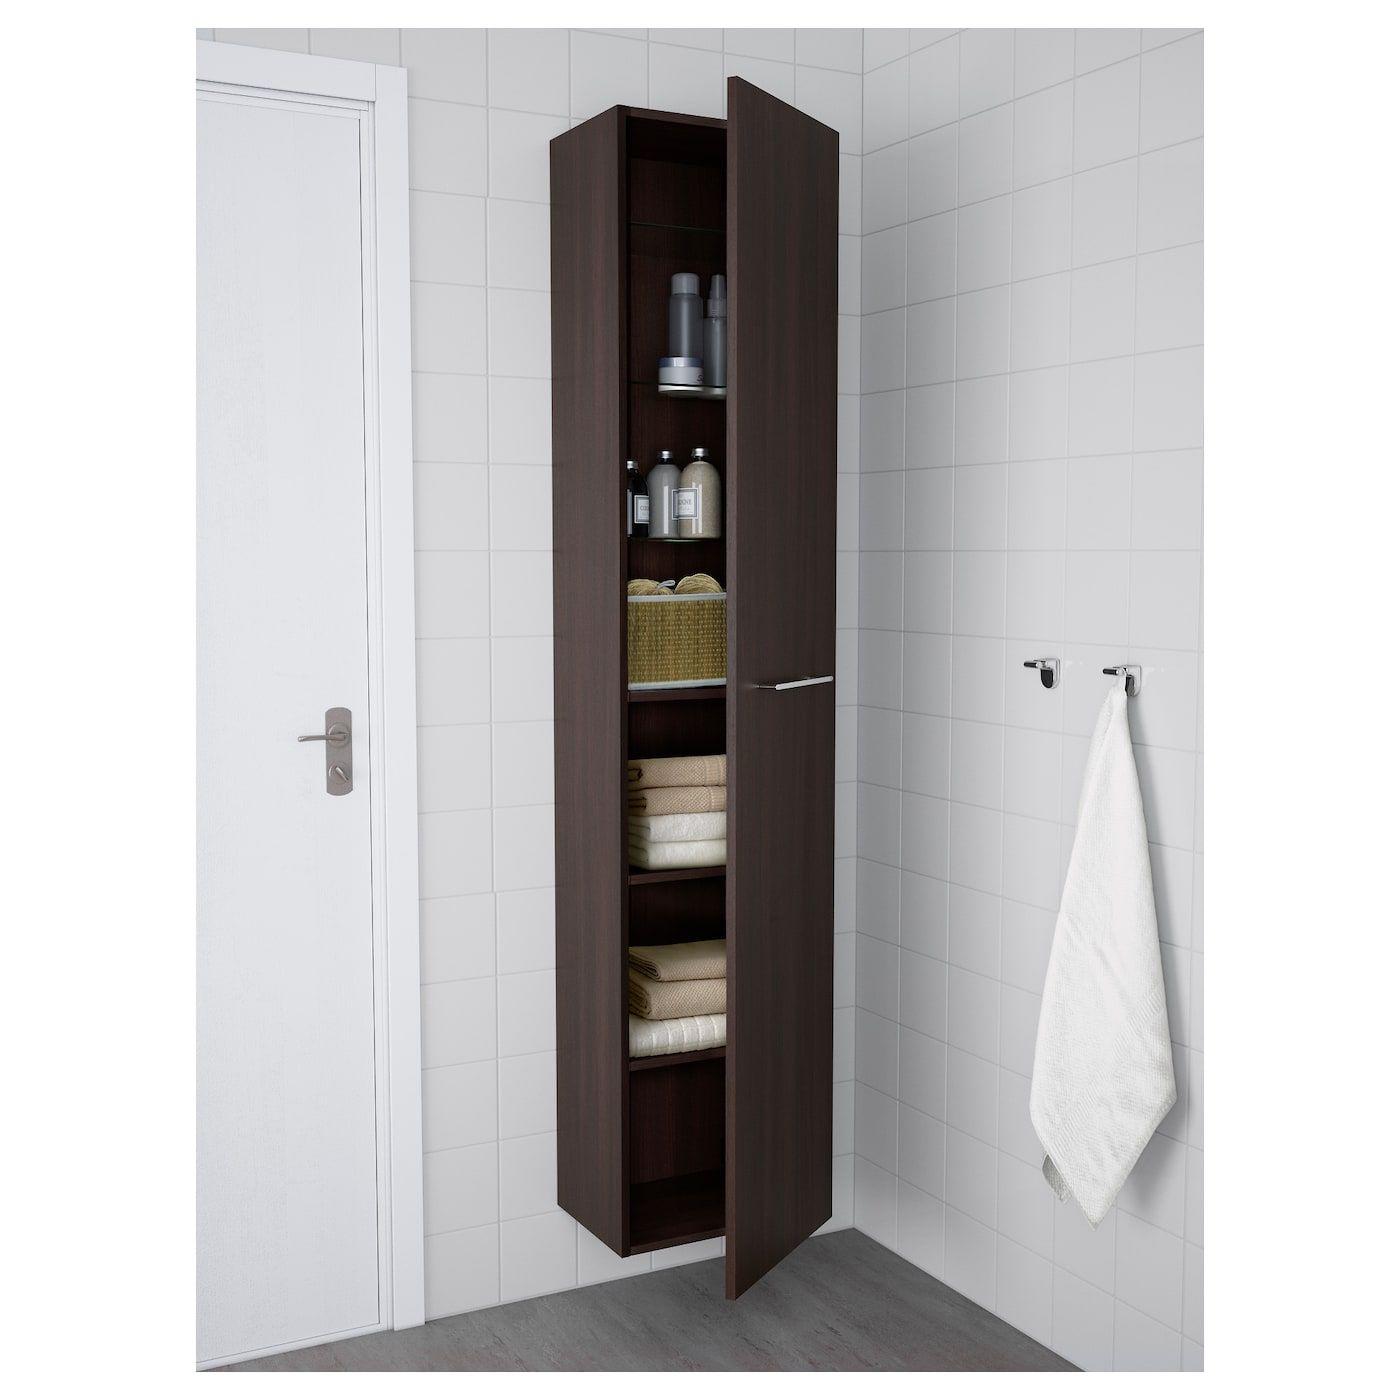 Godmorgon High Cabinet Black Brown 15 3 4x12 5 8x75 5 8 Ikea Ikea Godmorgon Hochschrank Ikea